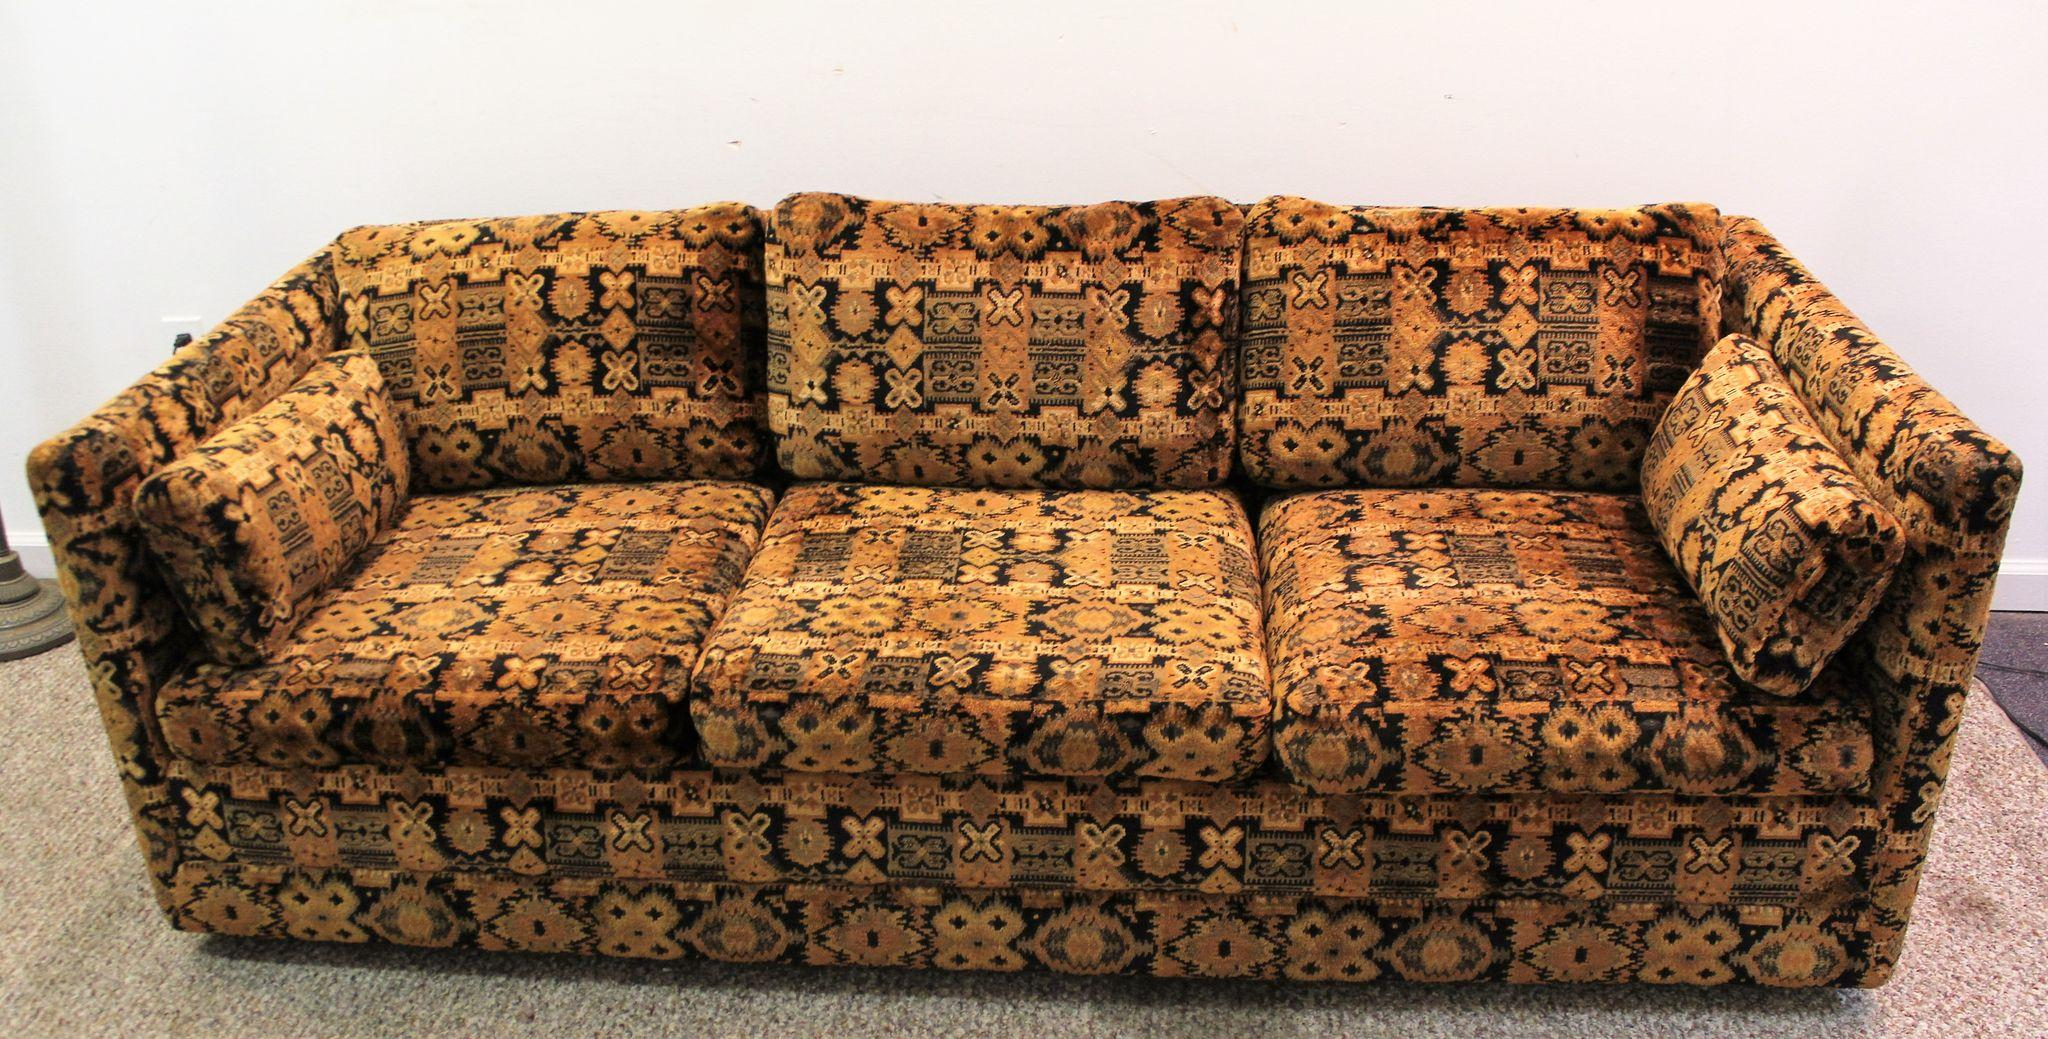 Vintage 1970s Mid Century Modern Milo Baughman Sofa Couch